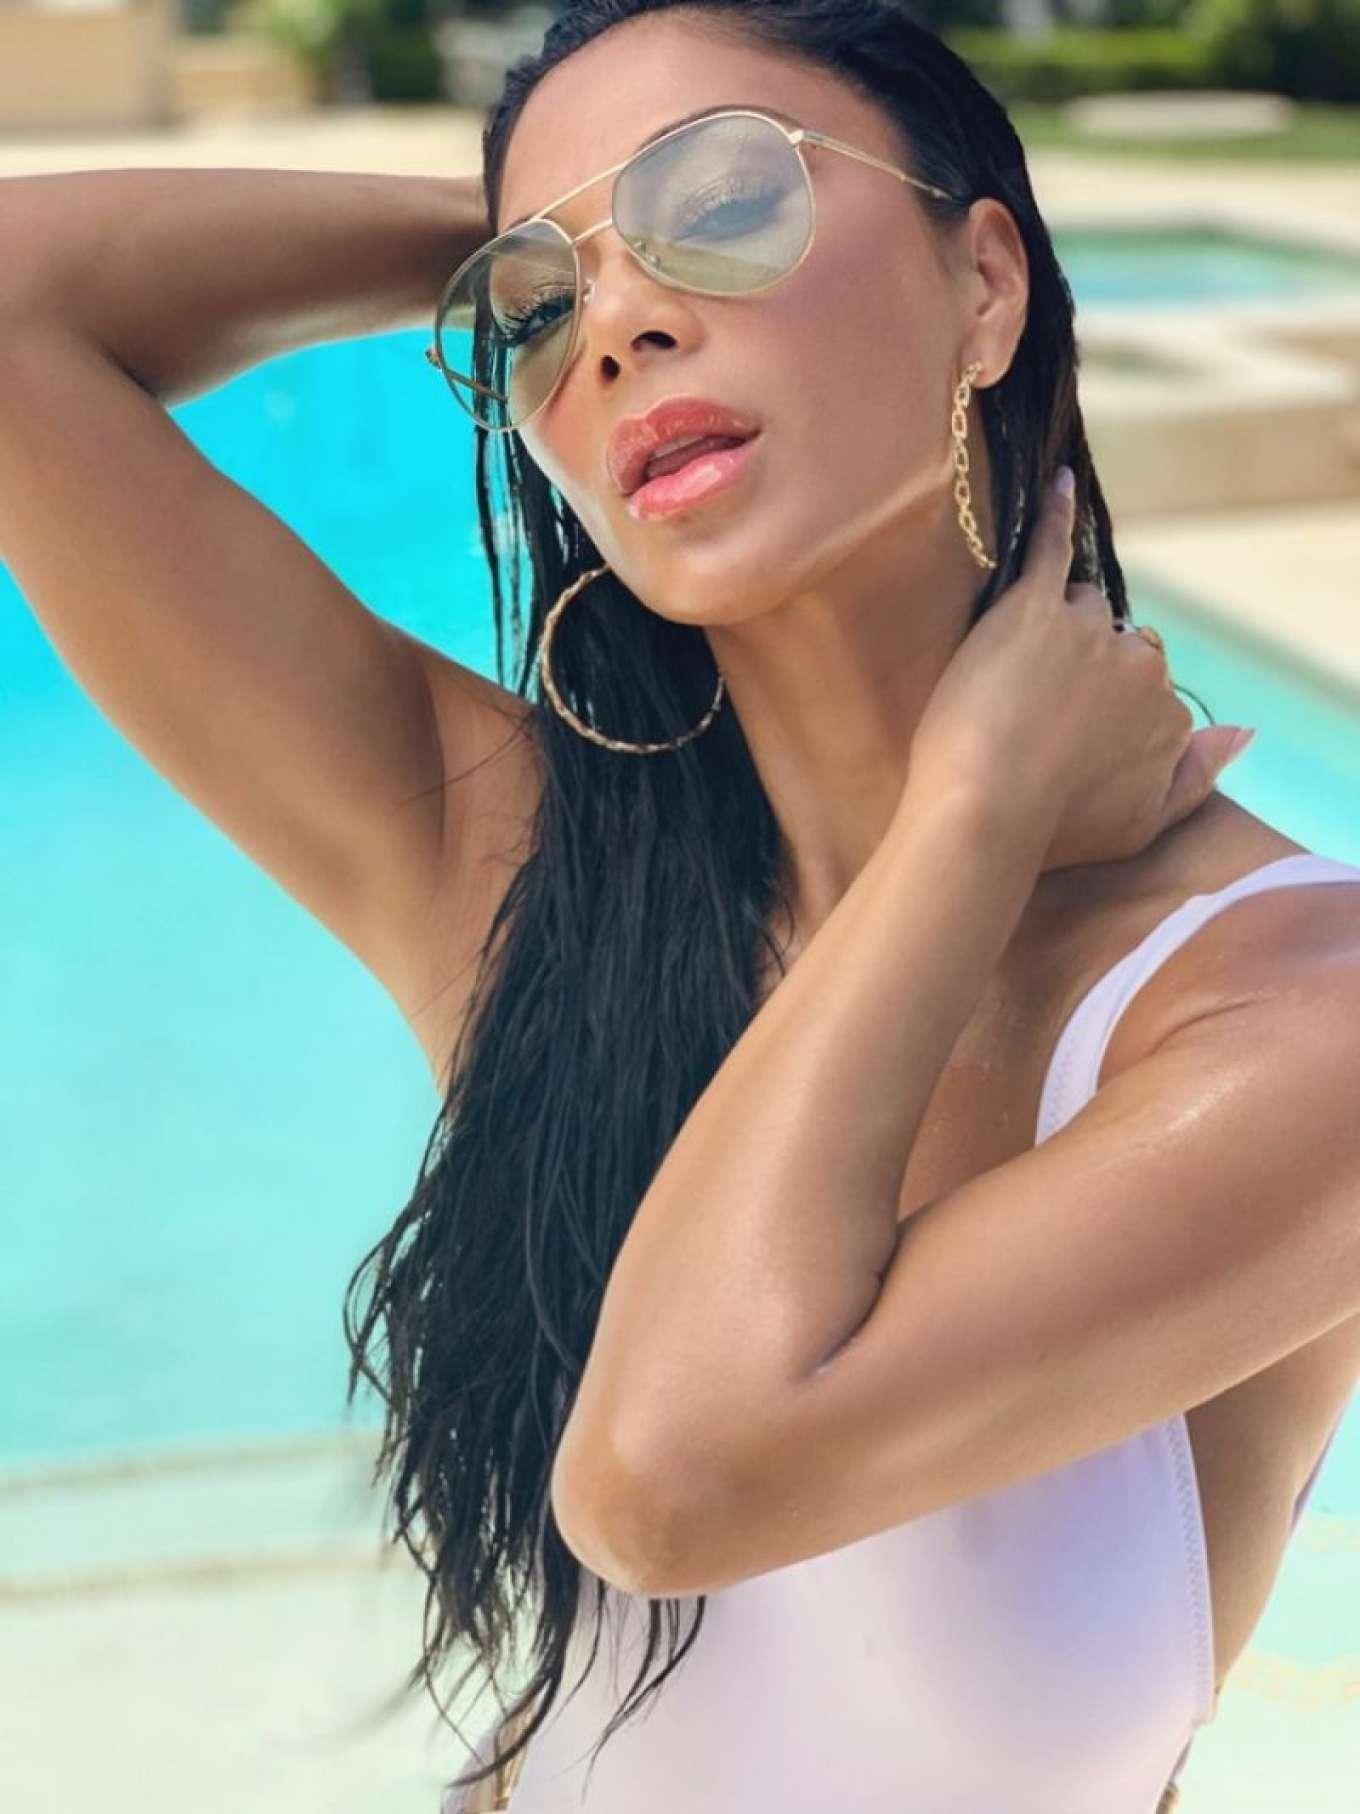 Nicole Scherzinger 2019 : Nicole Scherzinger – Swimsuit Photoshoot 2019-05